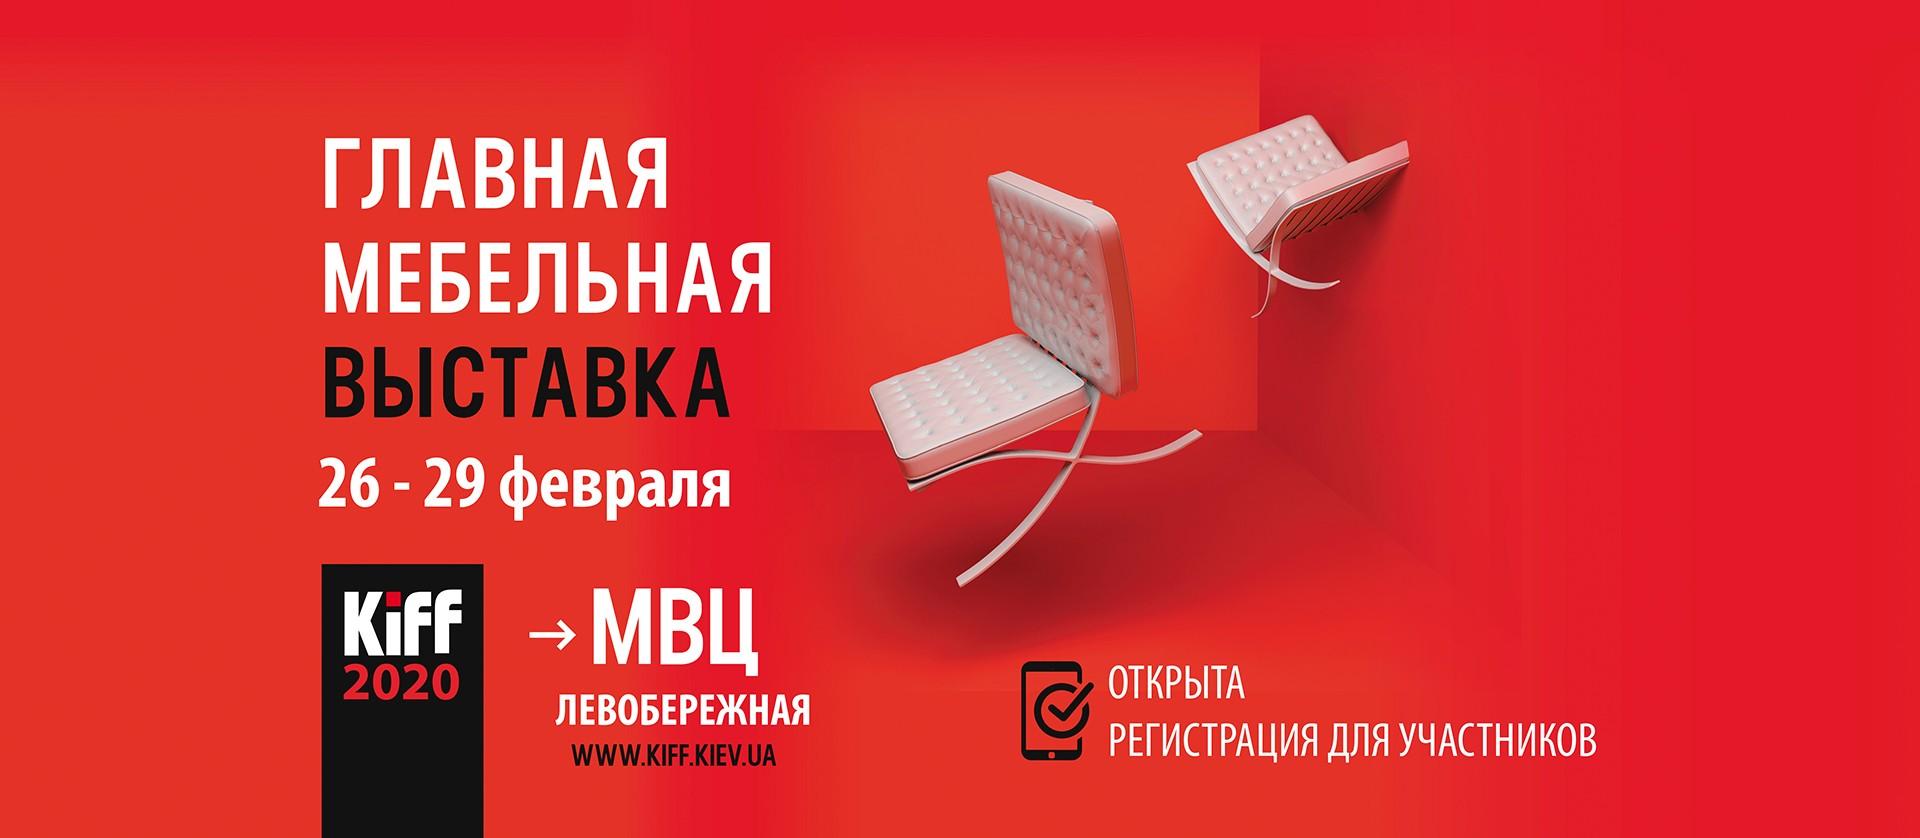 kiff 1375 600 rus 3 1 - Главная